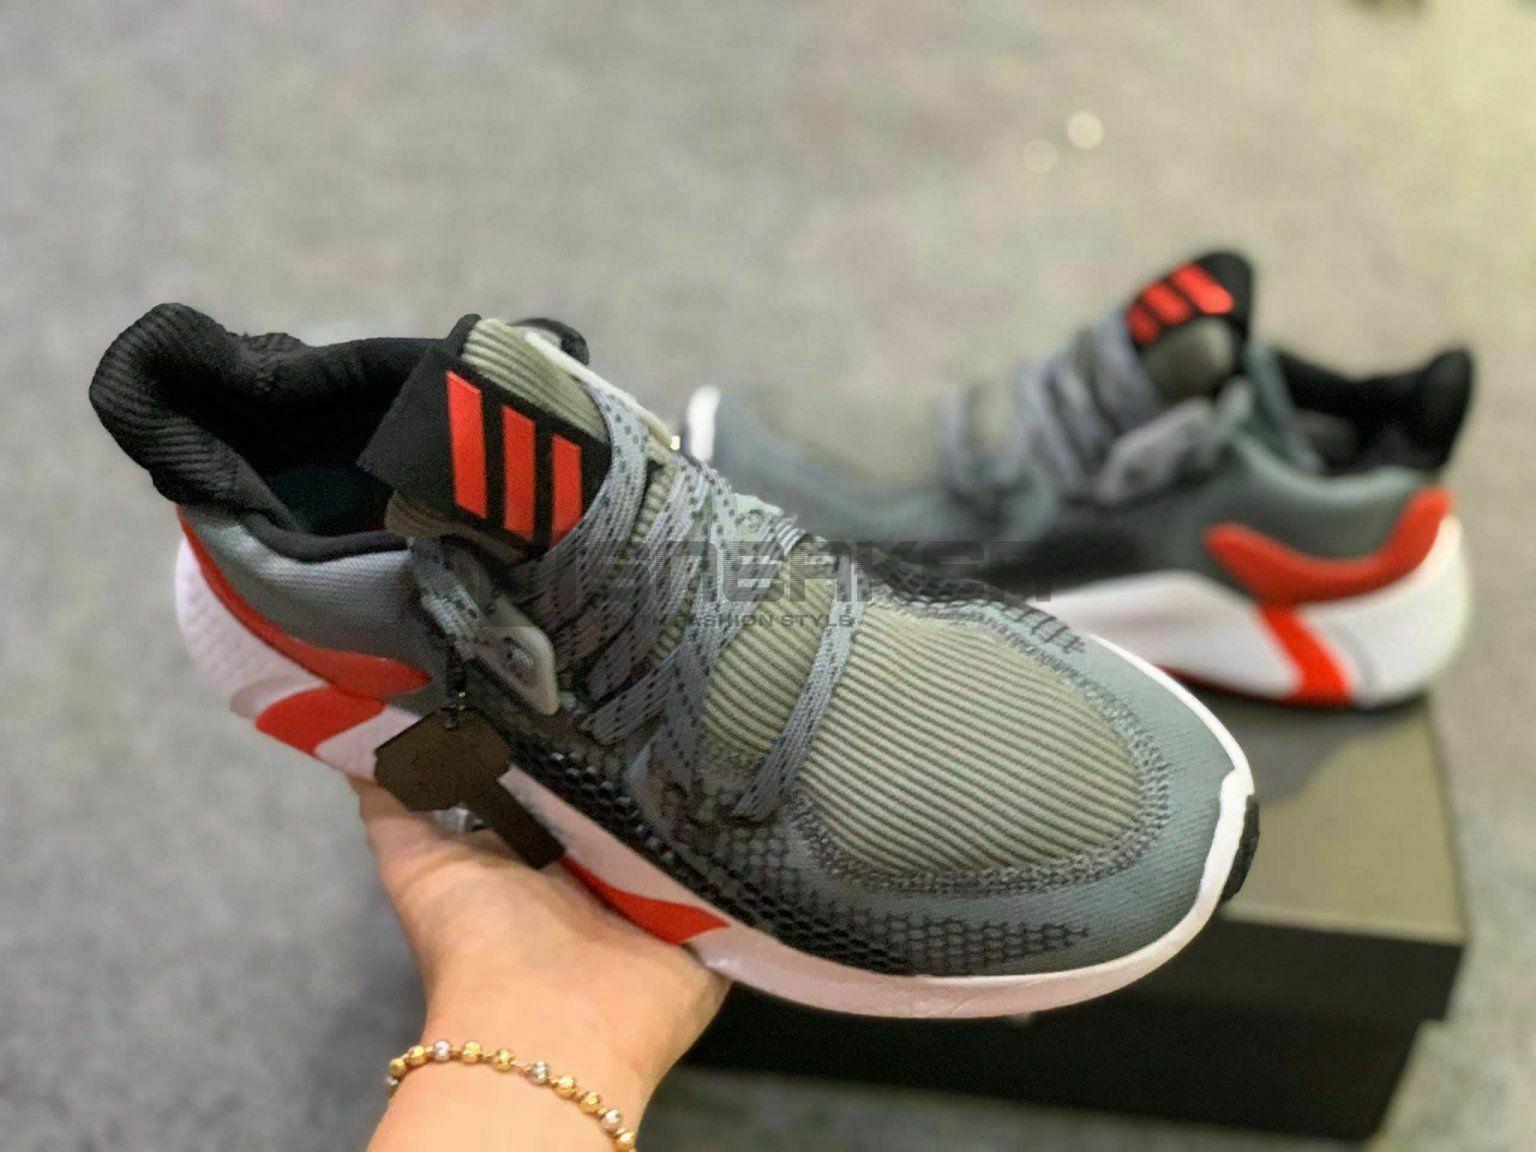 Giay Adidas Alphabounce Instinct M Do Xam 3